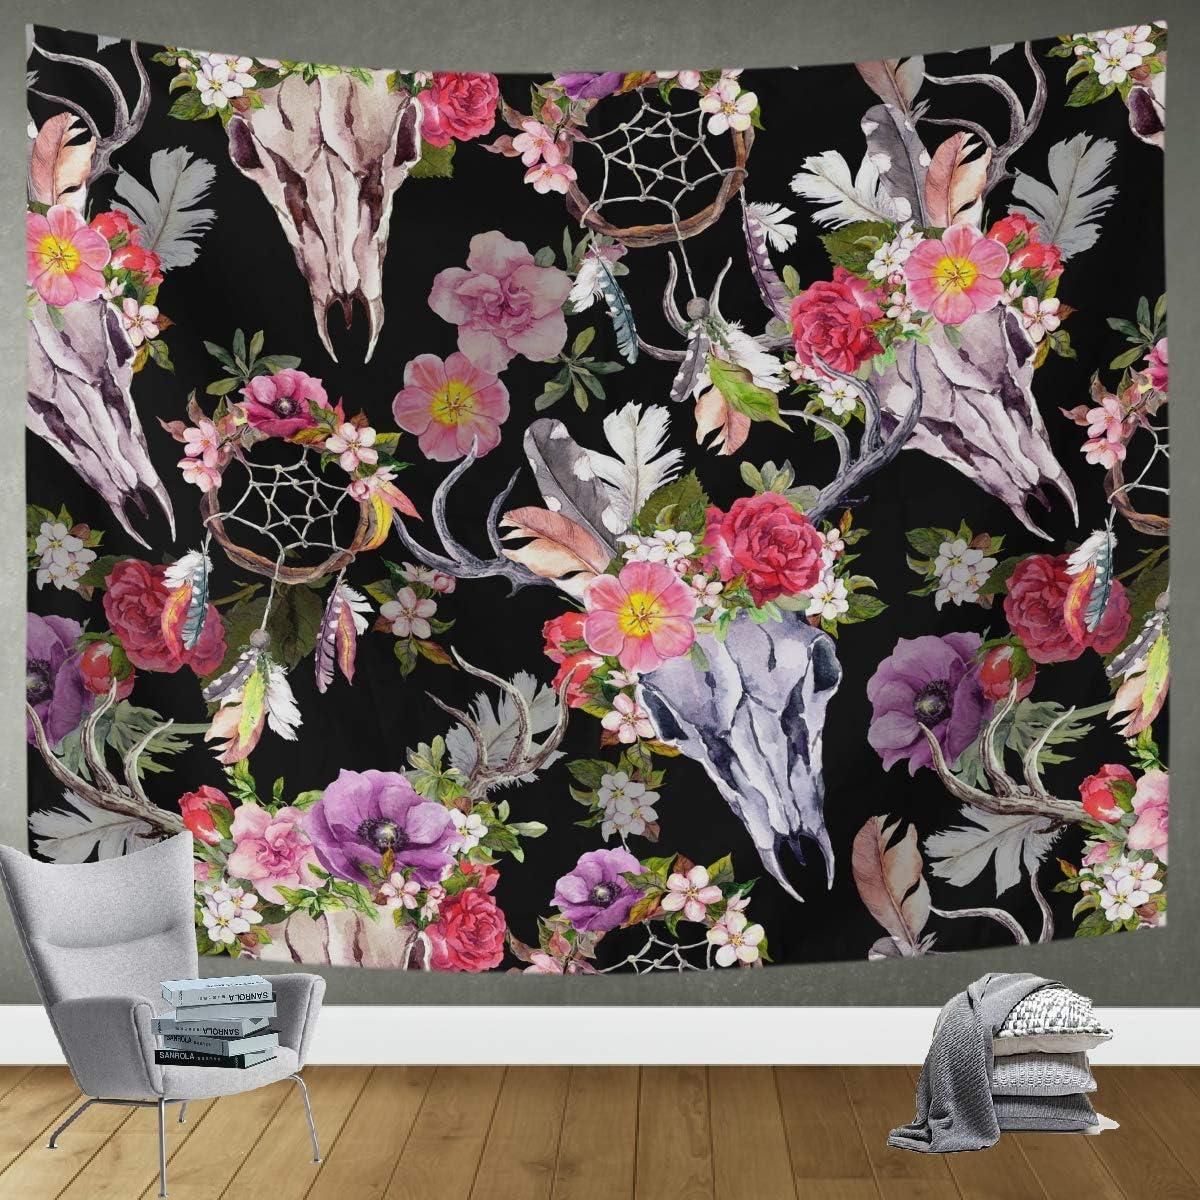 DOMIKING Wall Hanging Tapestry Bedroom Decor - Deer Skulls Flowers Dreamcatcher Large Tapestries for Bedroom Living Room 60x51in Wall Blanket